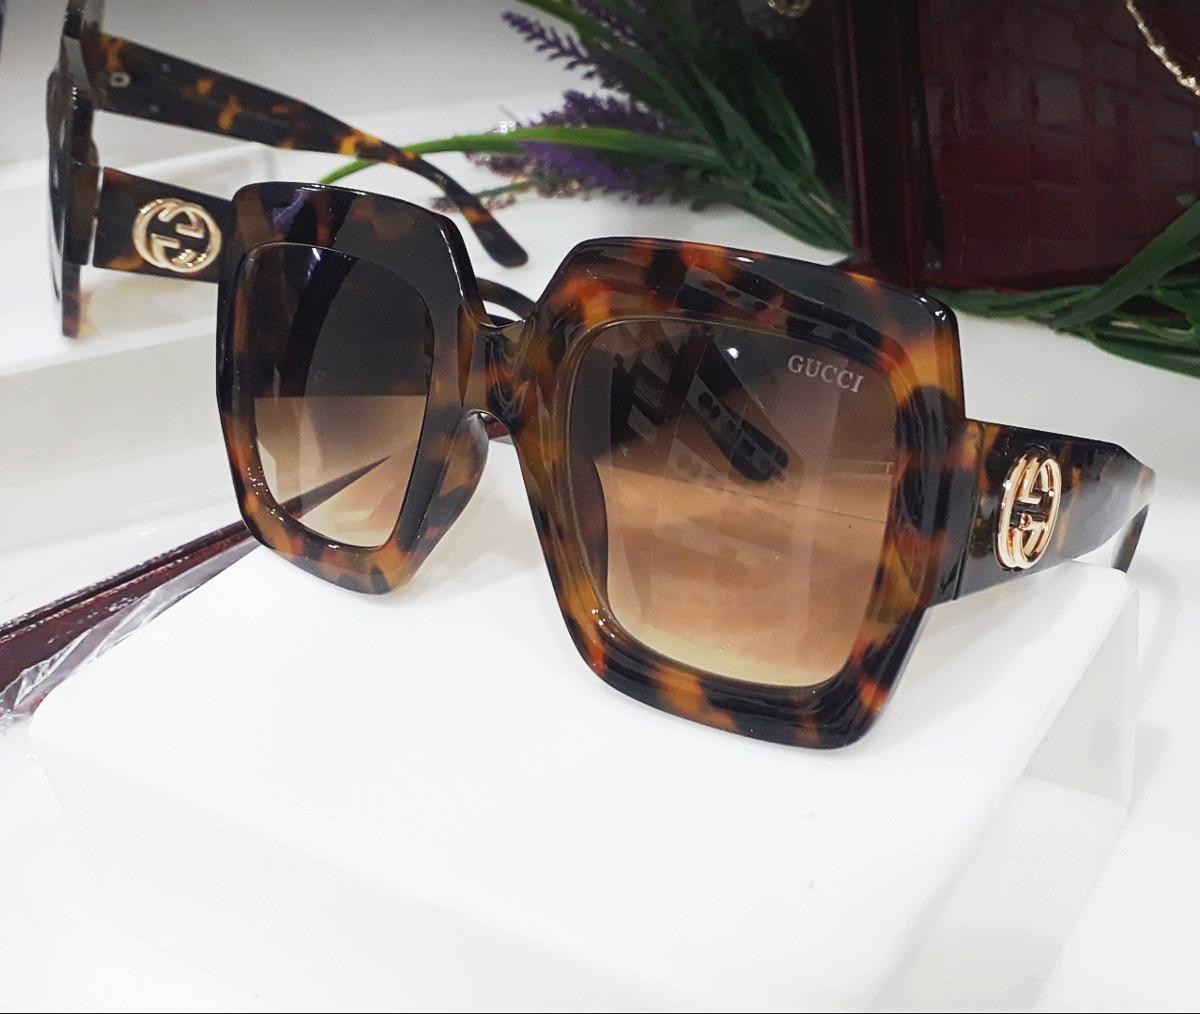 37902e4d6efd8 Óculos De Sol Gucci Quadrado Tartaruga Grande Uv400 - R  120,00 em ...